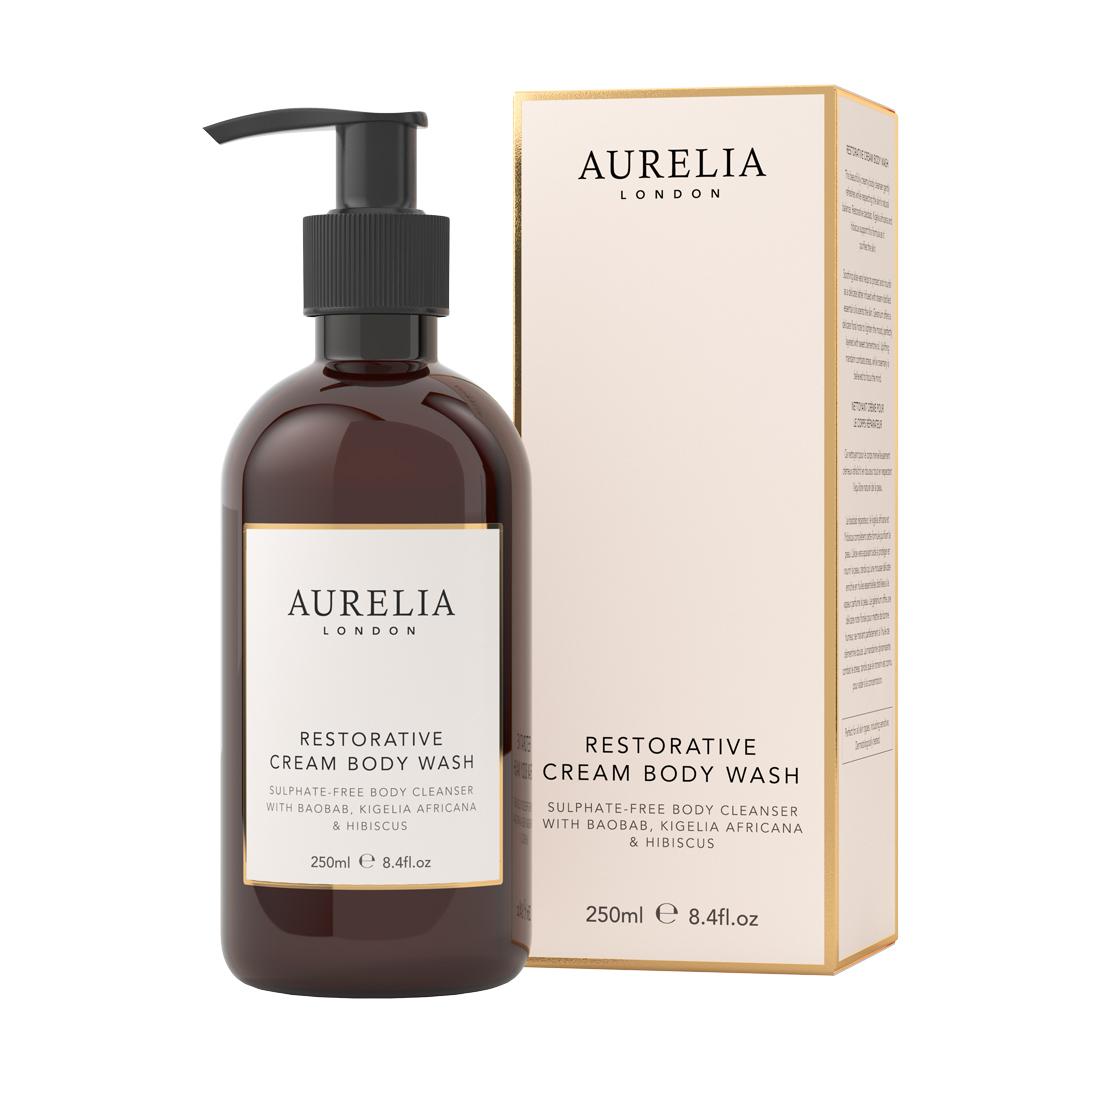 An image of Restorative Cream Body Wash 250ml Aurelia London